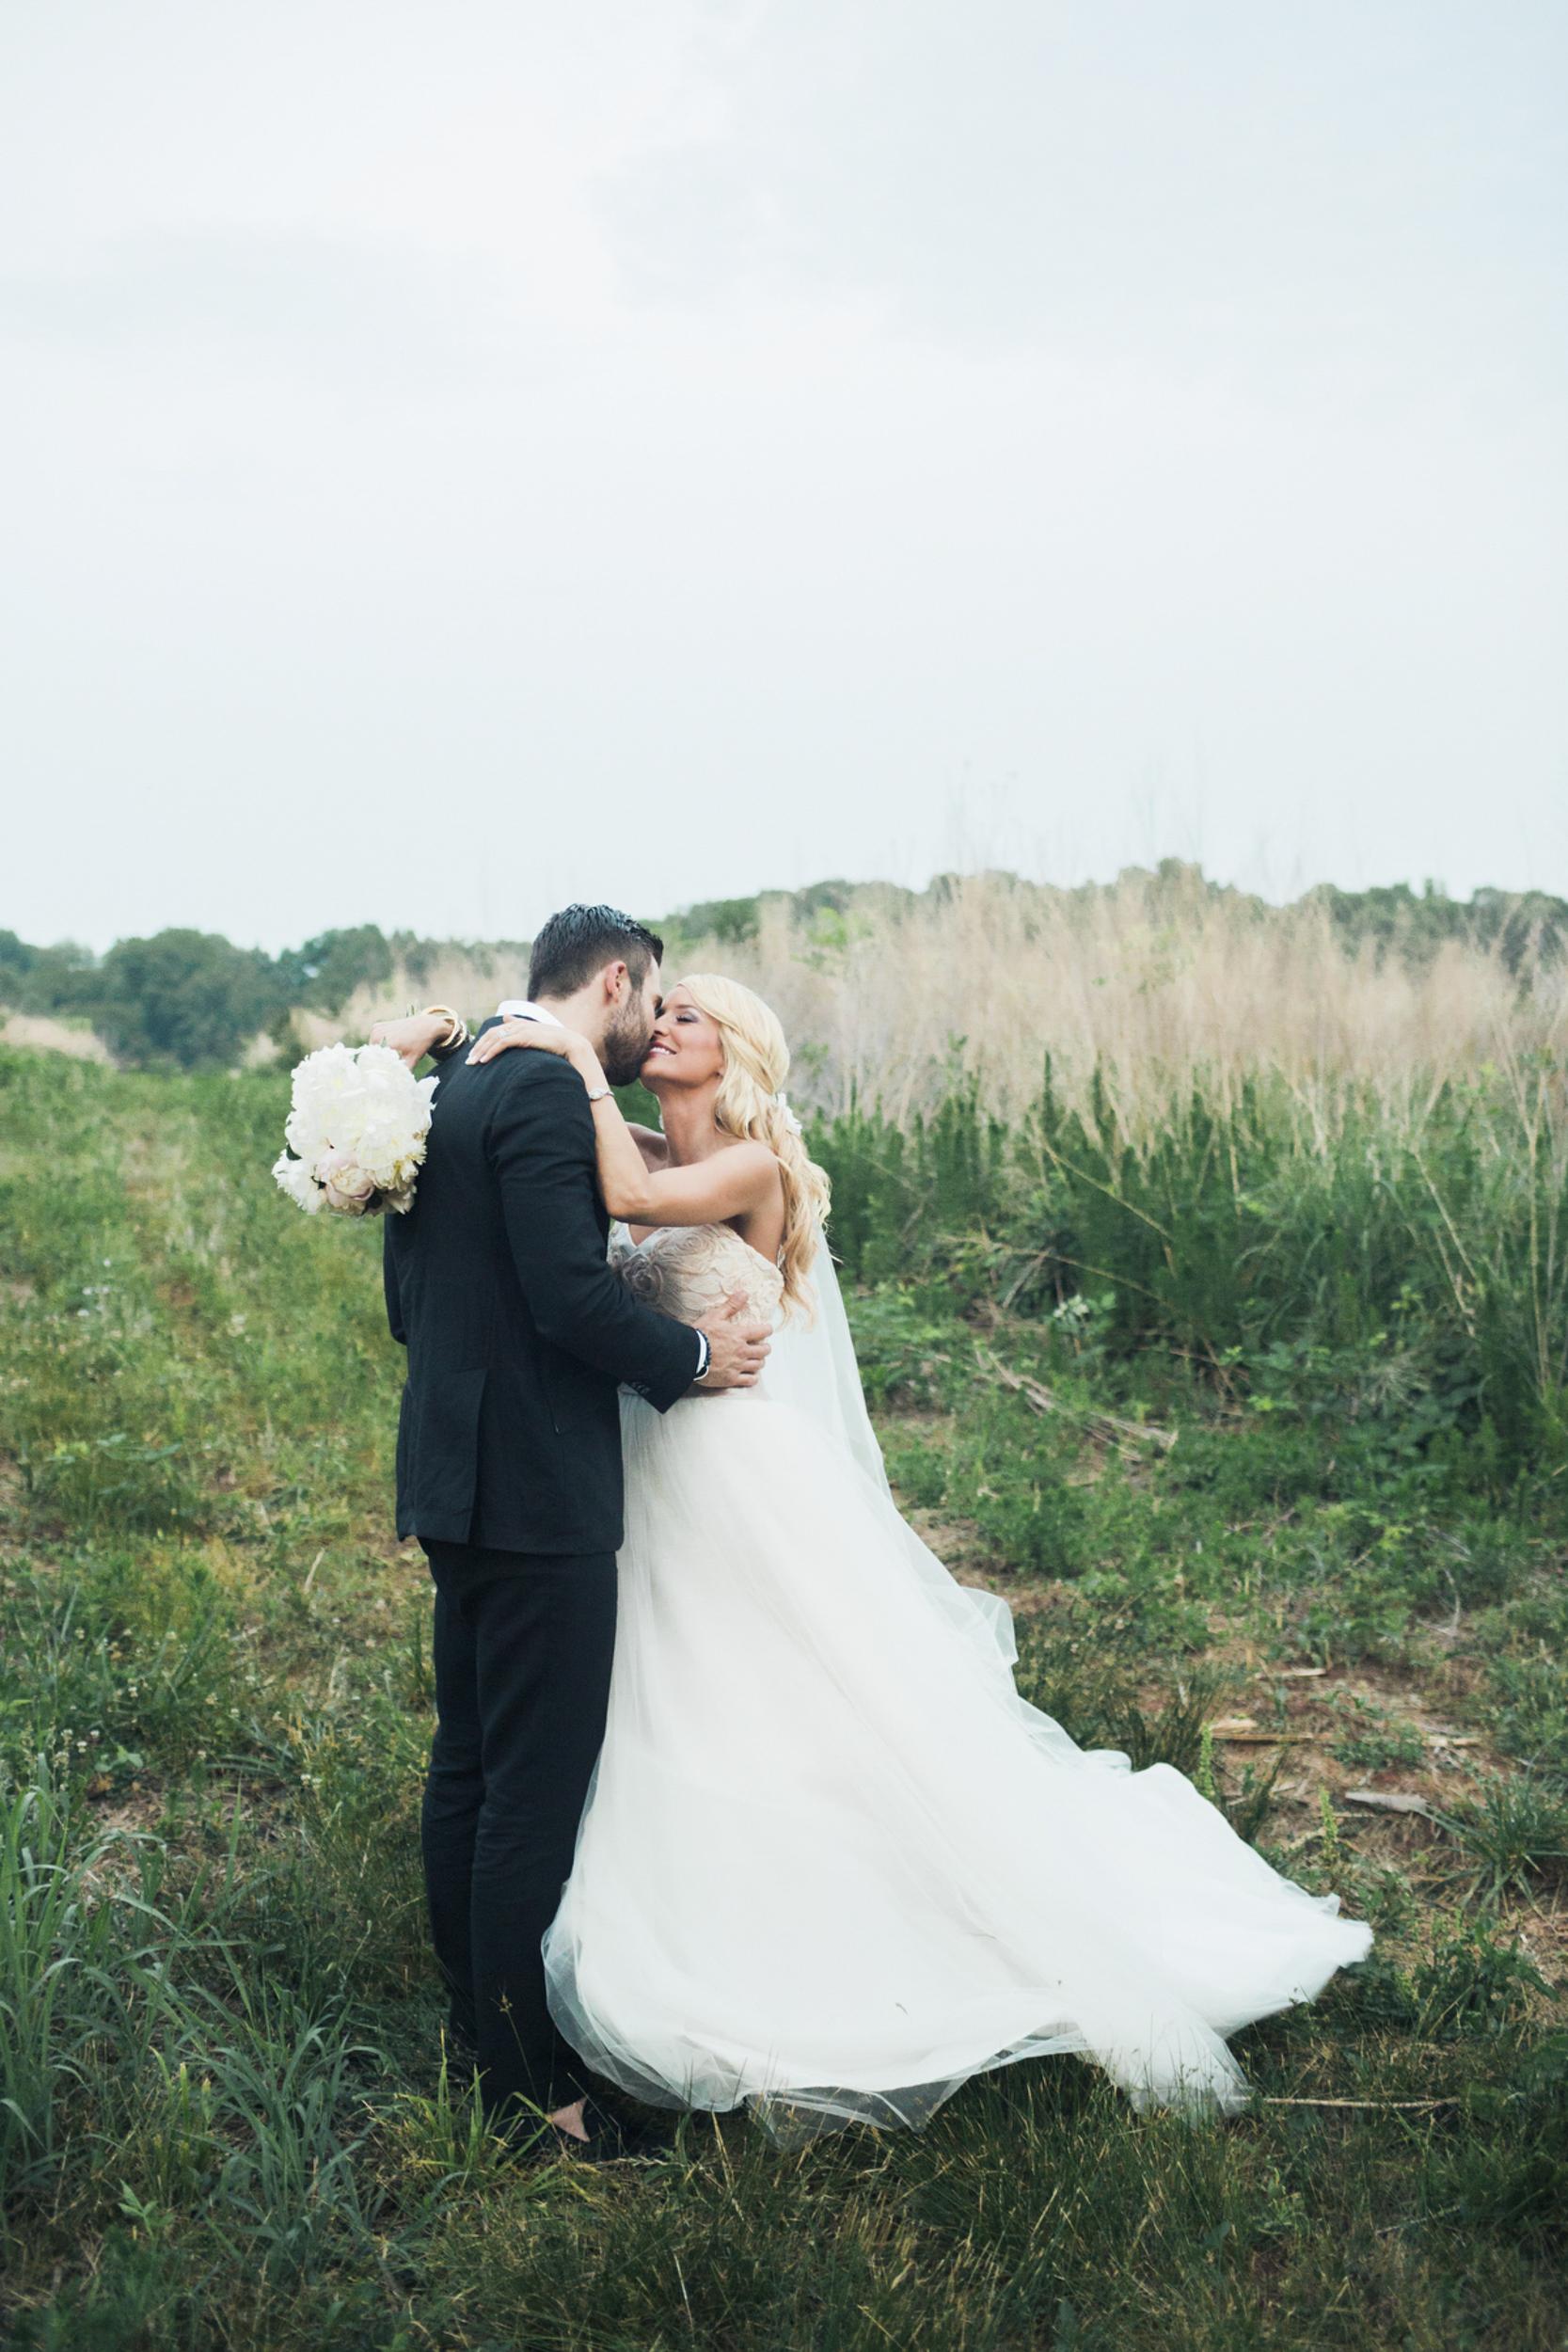 south_carolina_farm_wedding_rustic_chic_surprise_secret_luxe_wedding_bachelorette_emily_maynard_real_weddings-34.jpg